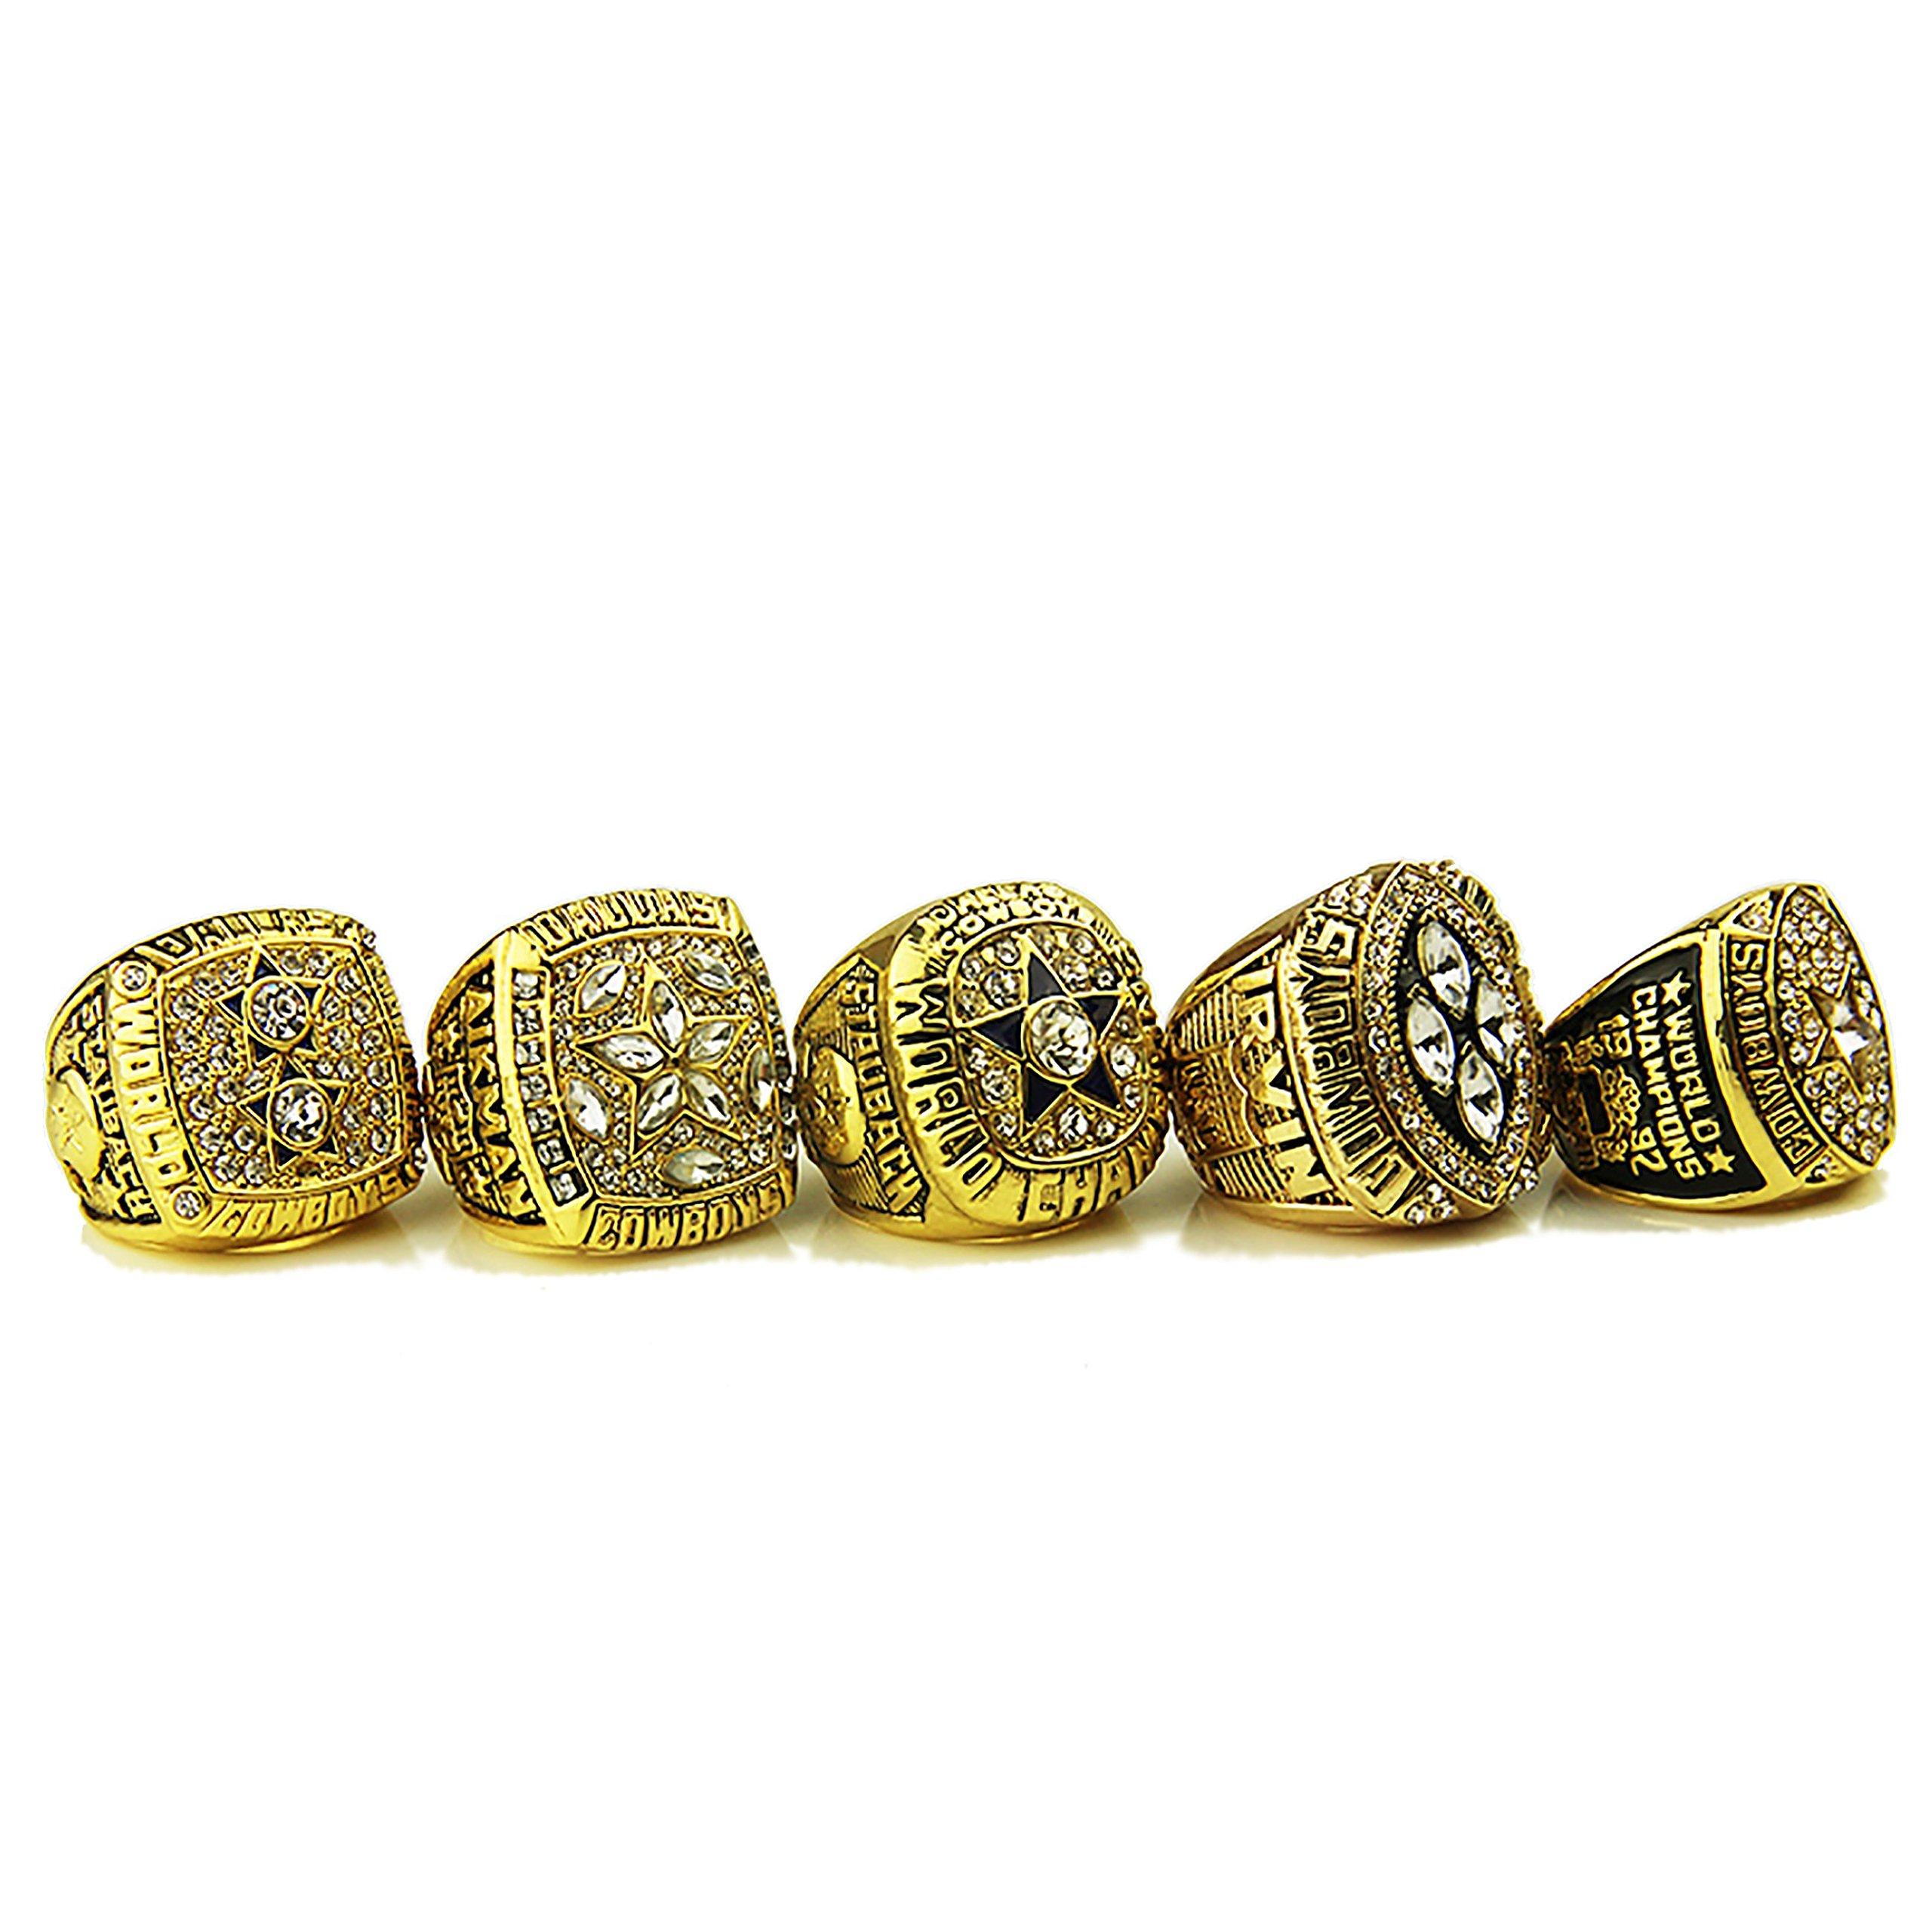 GF-sports store Dallas Cowboys Supper Bowl Championship Rings Display Box Full Set Replica (Yellow)